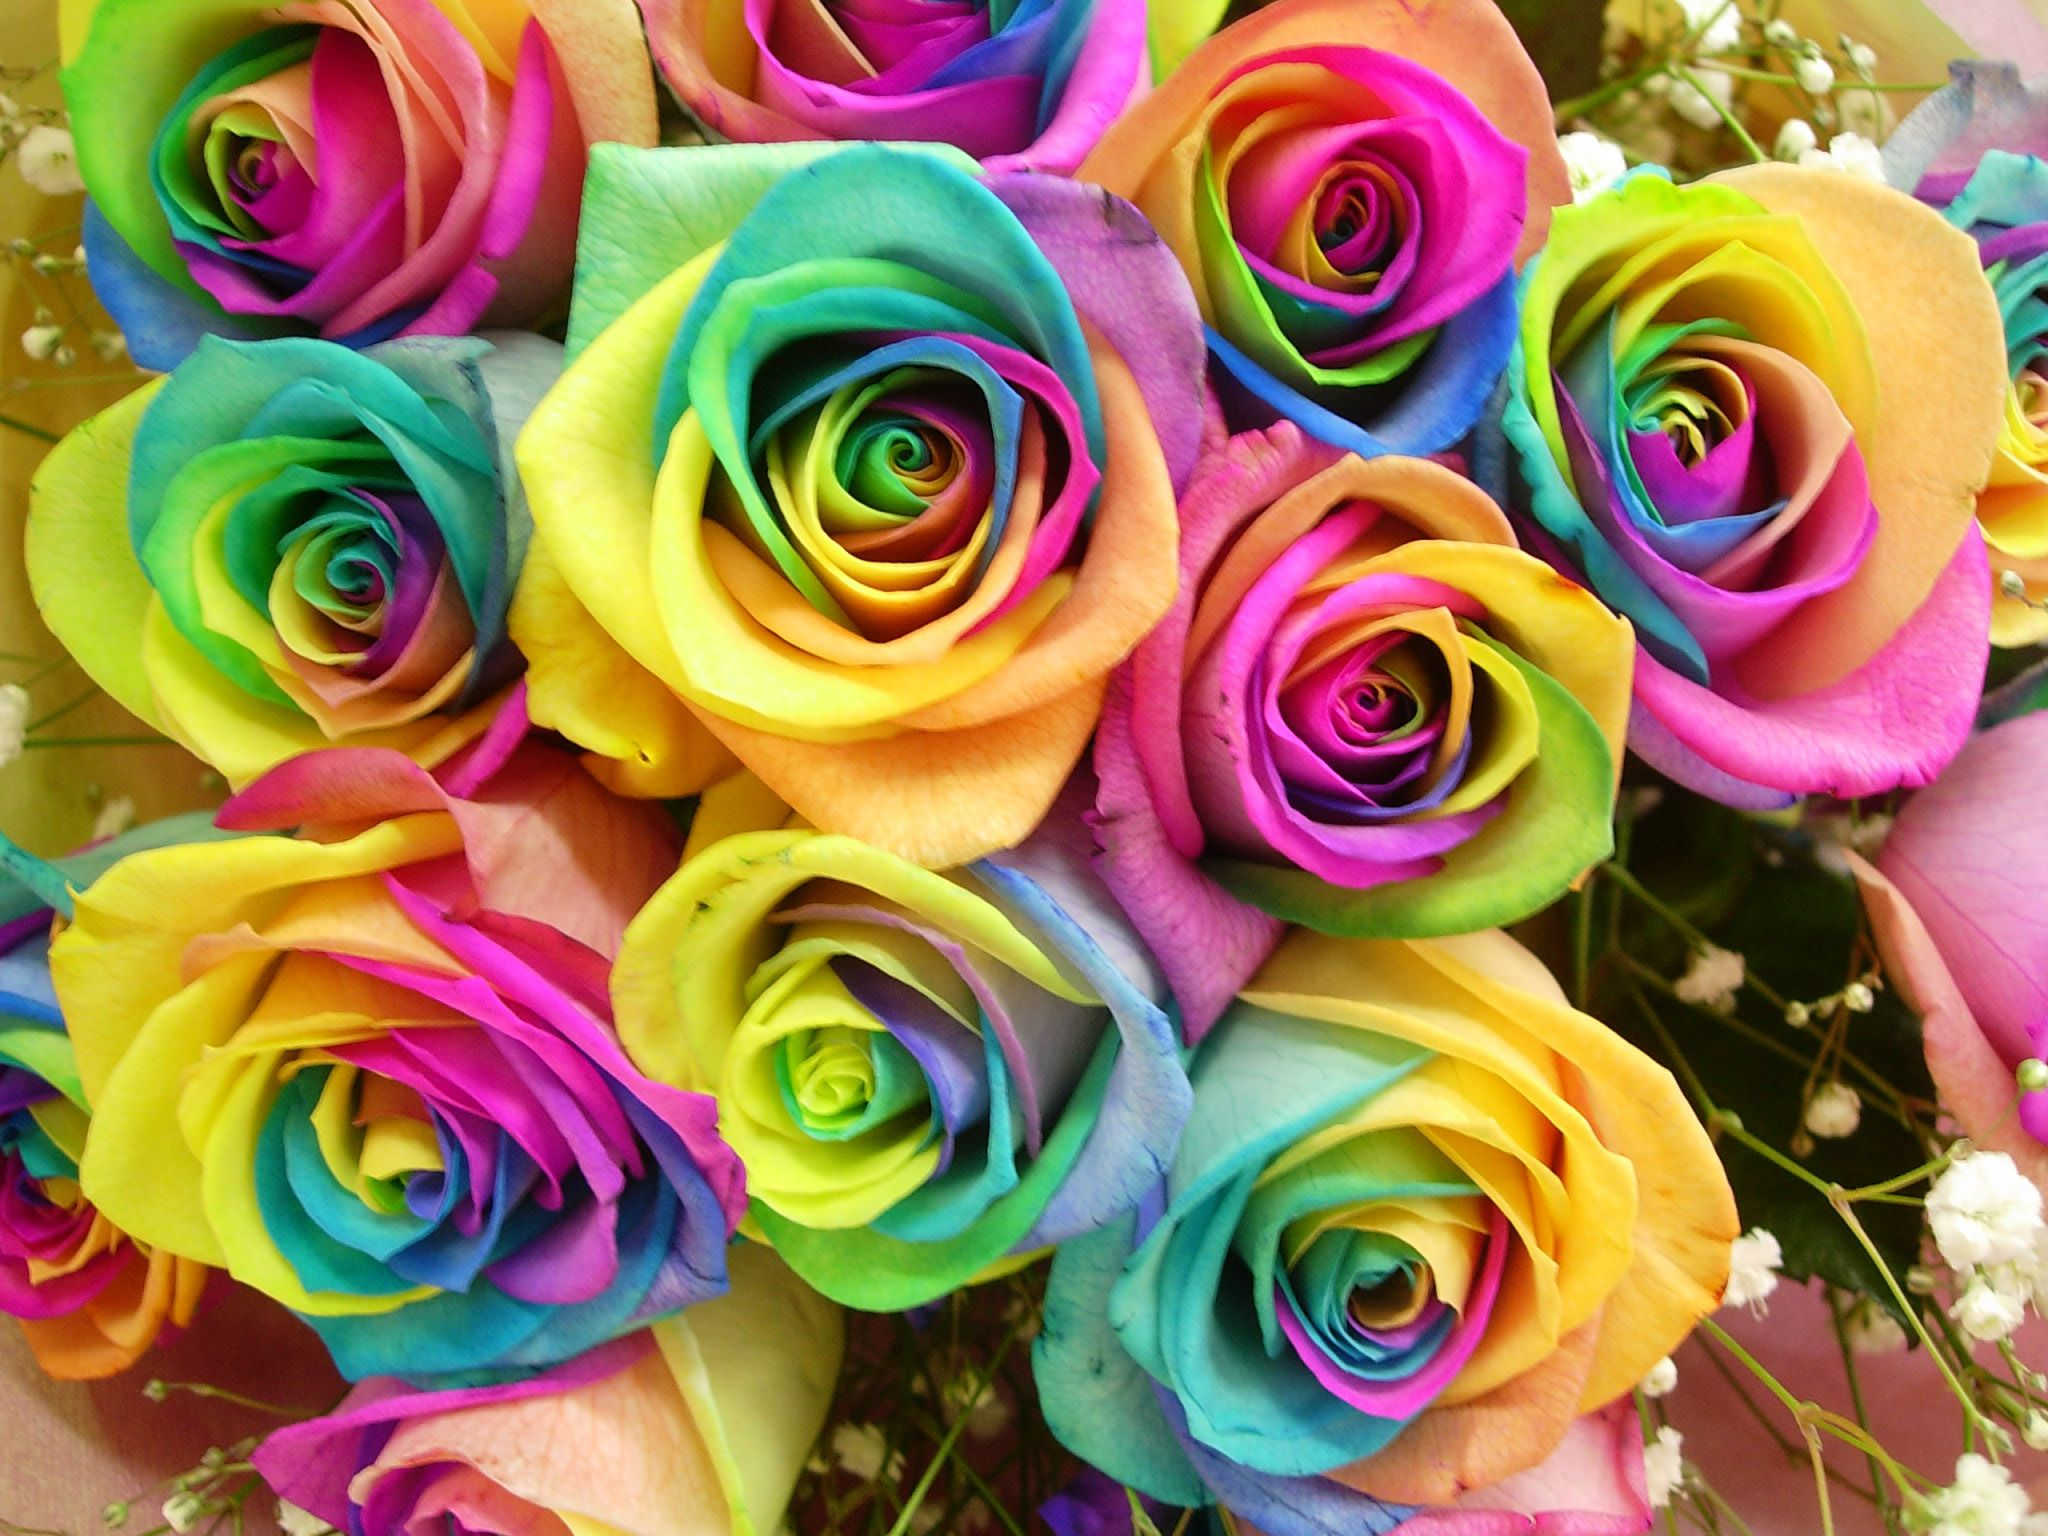 Картинки букет белые розы